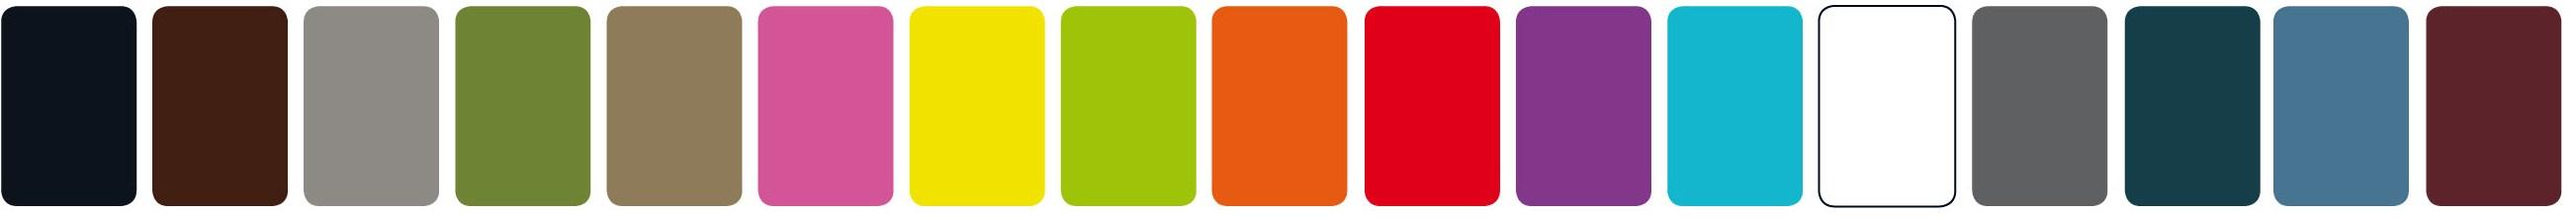 barevná řada Qui ist Paul